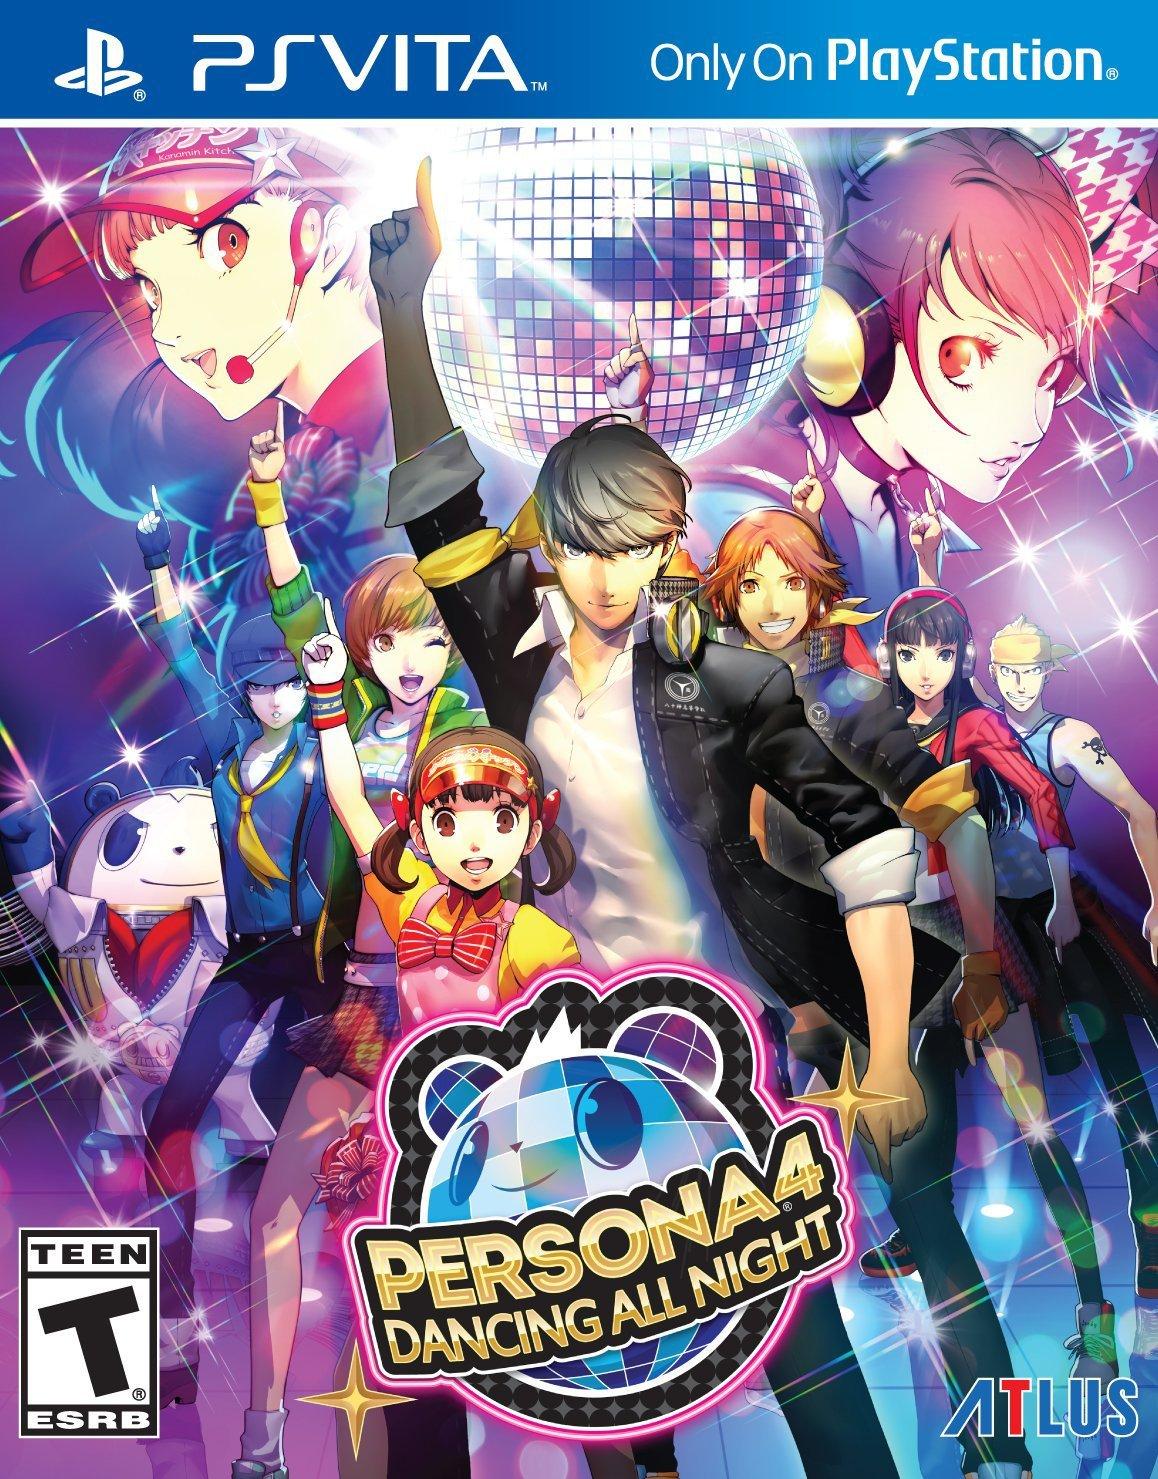 Persona 4: Dancing All Night PSVita Physical Game Cartridge US